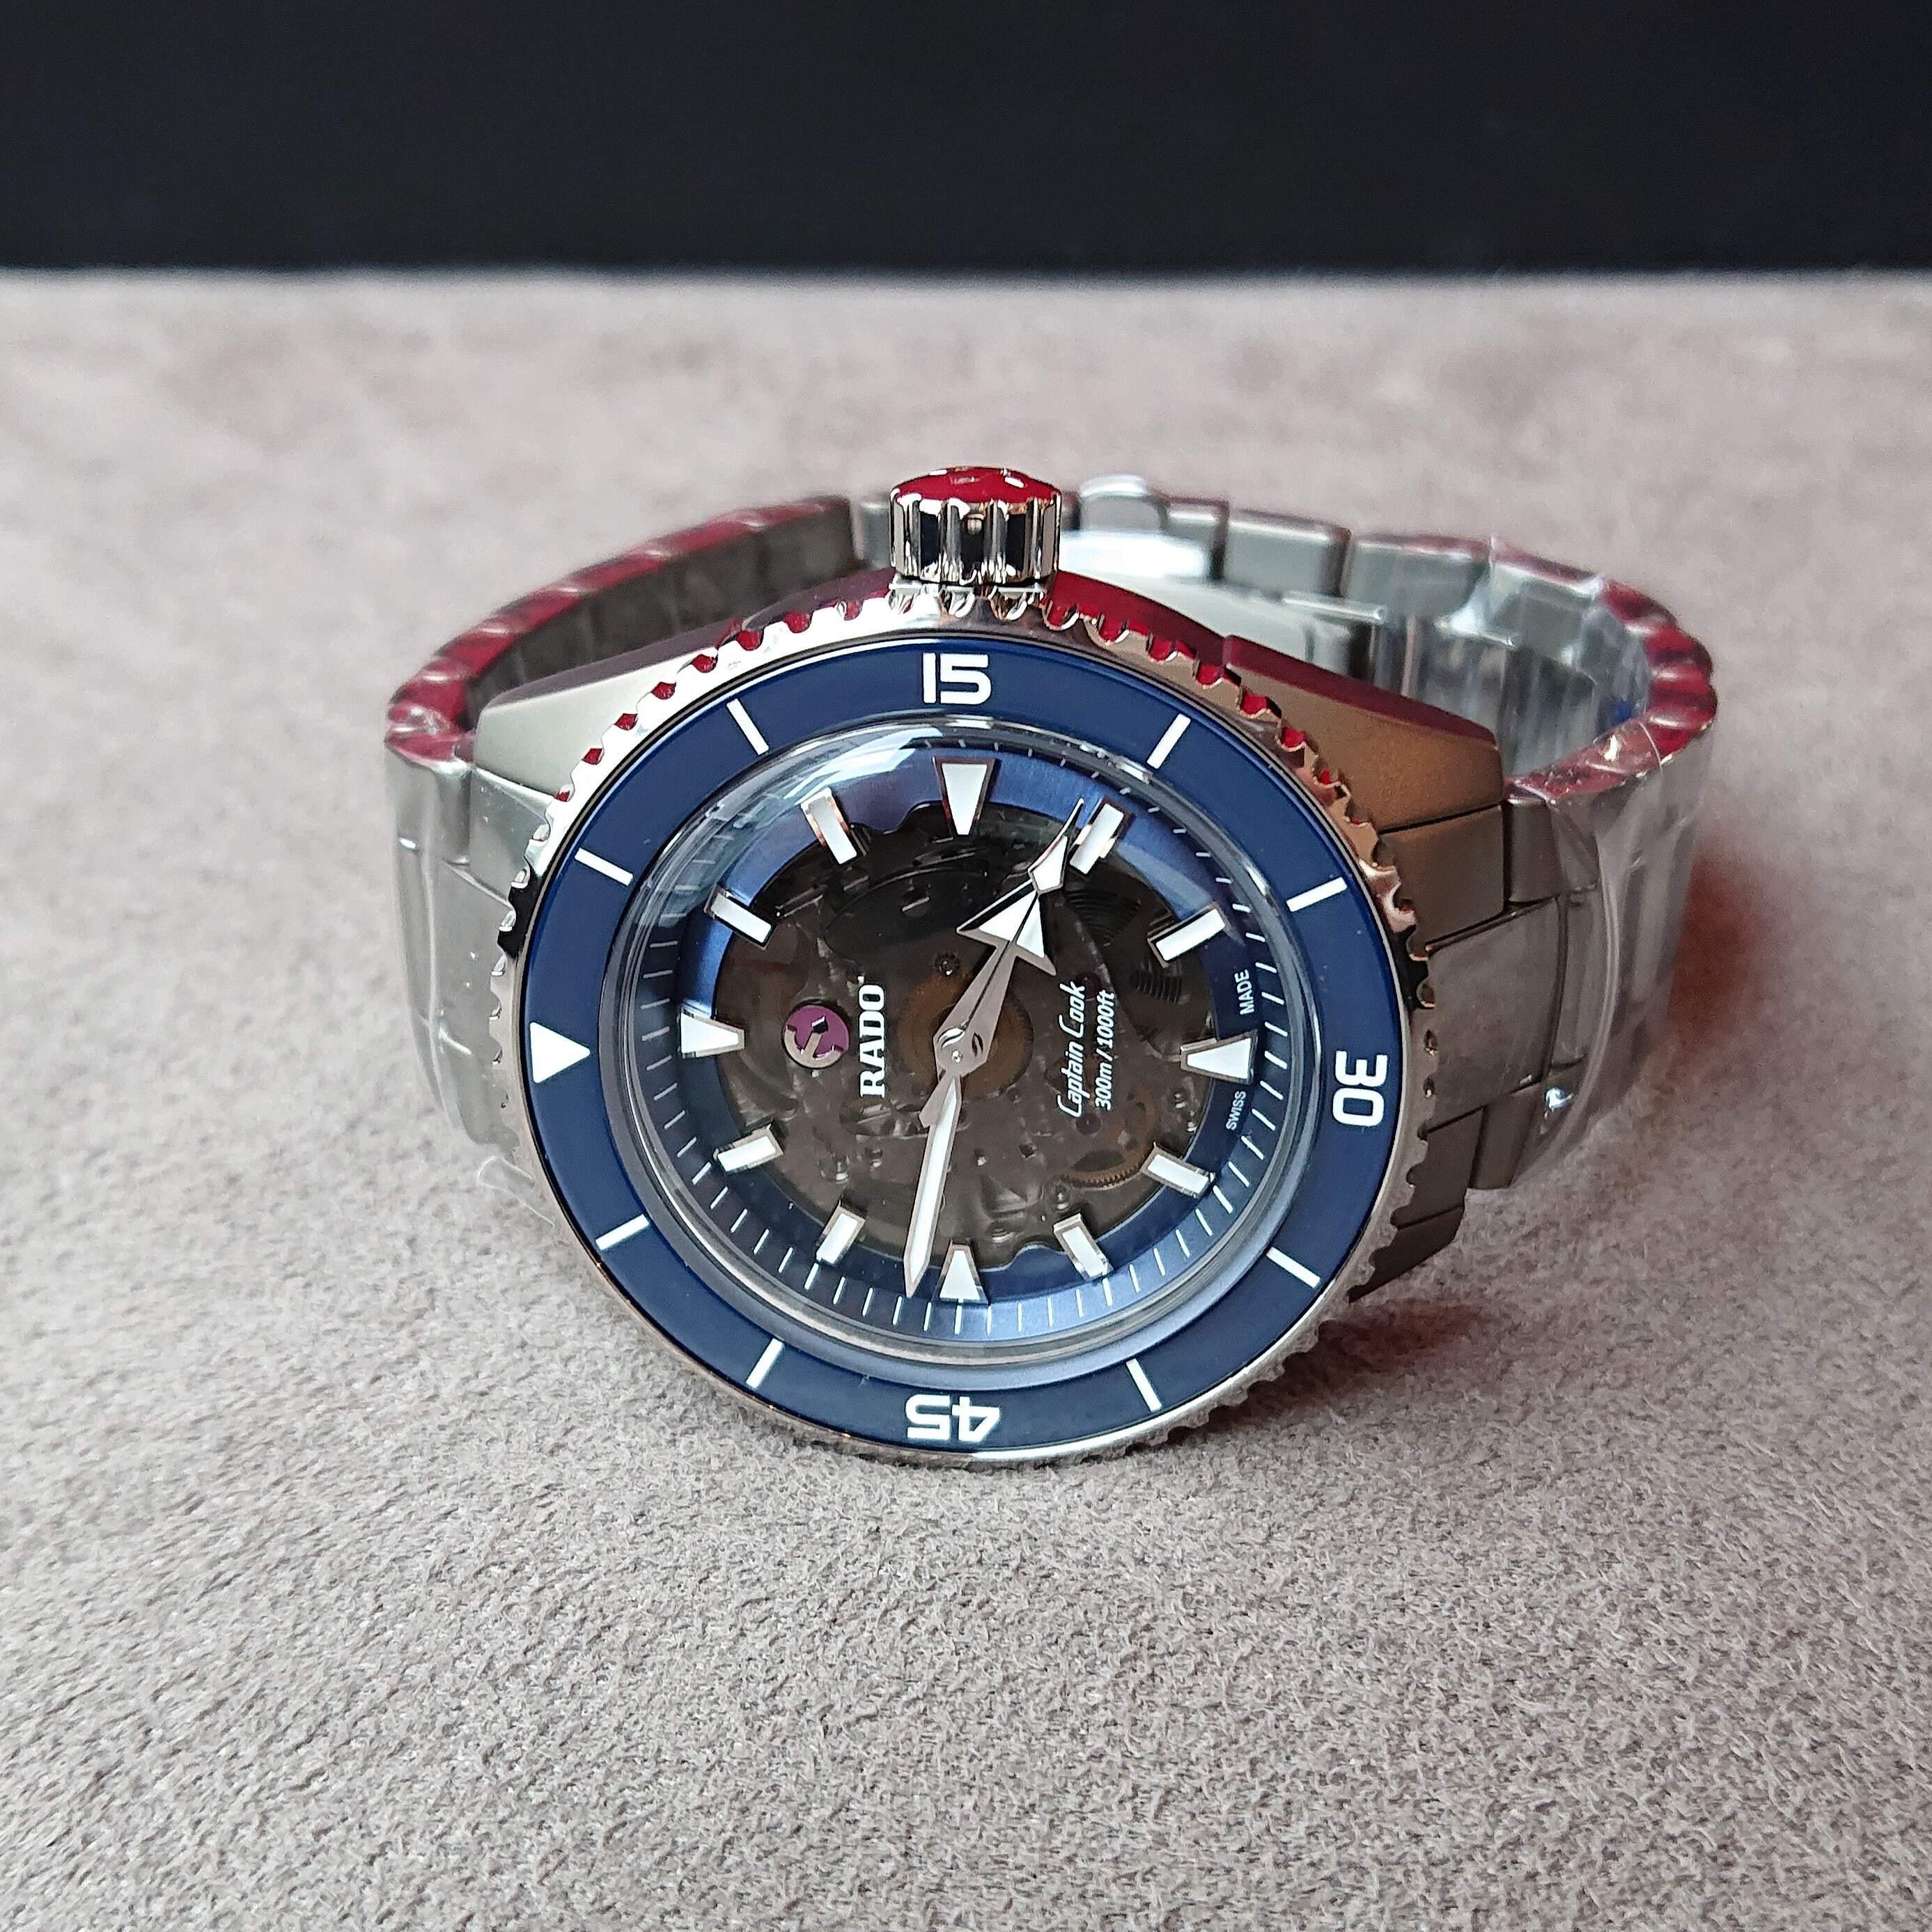 【RADO ラドー】Captain Cook High-Tech Ceramic キャプテンクック ハイテクセラミック(プラズマ×ブルー)/国内正規品 腕時計